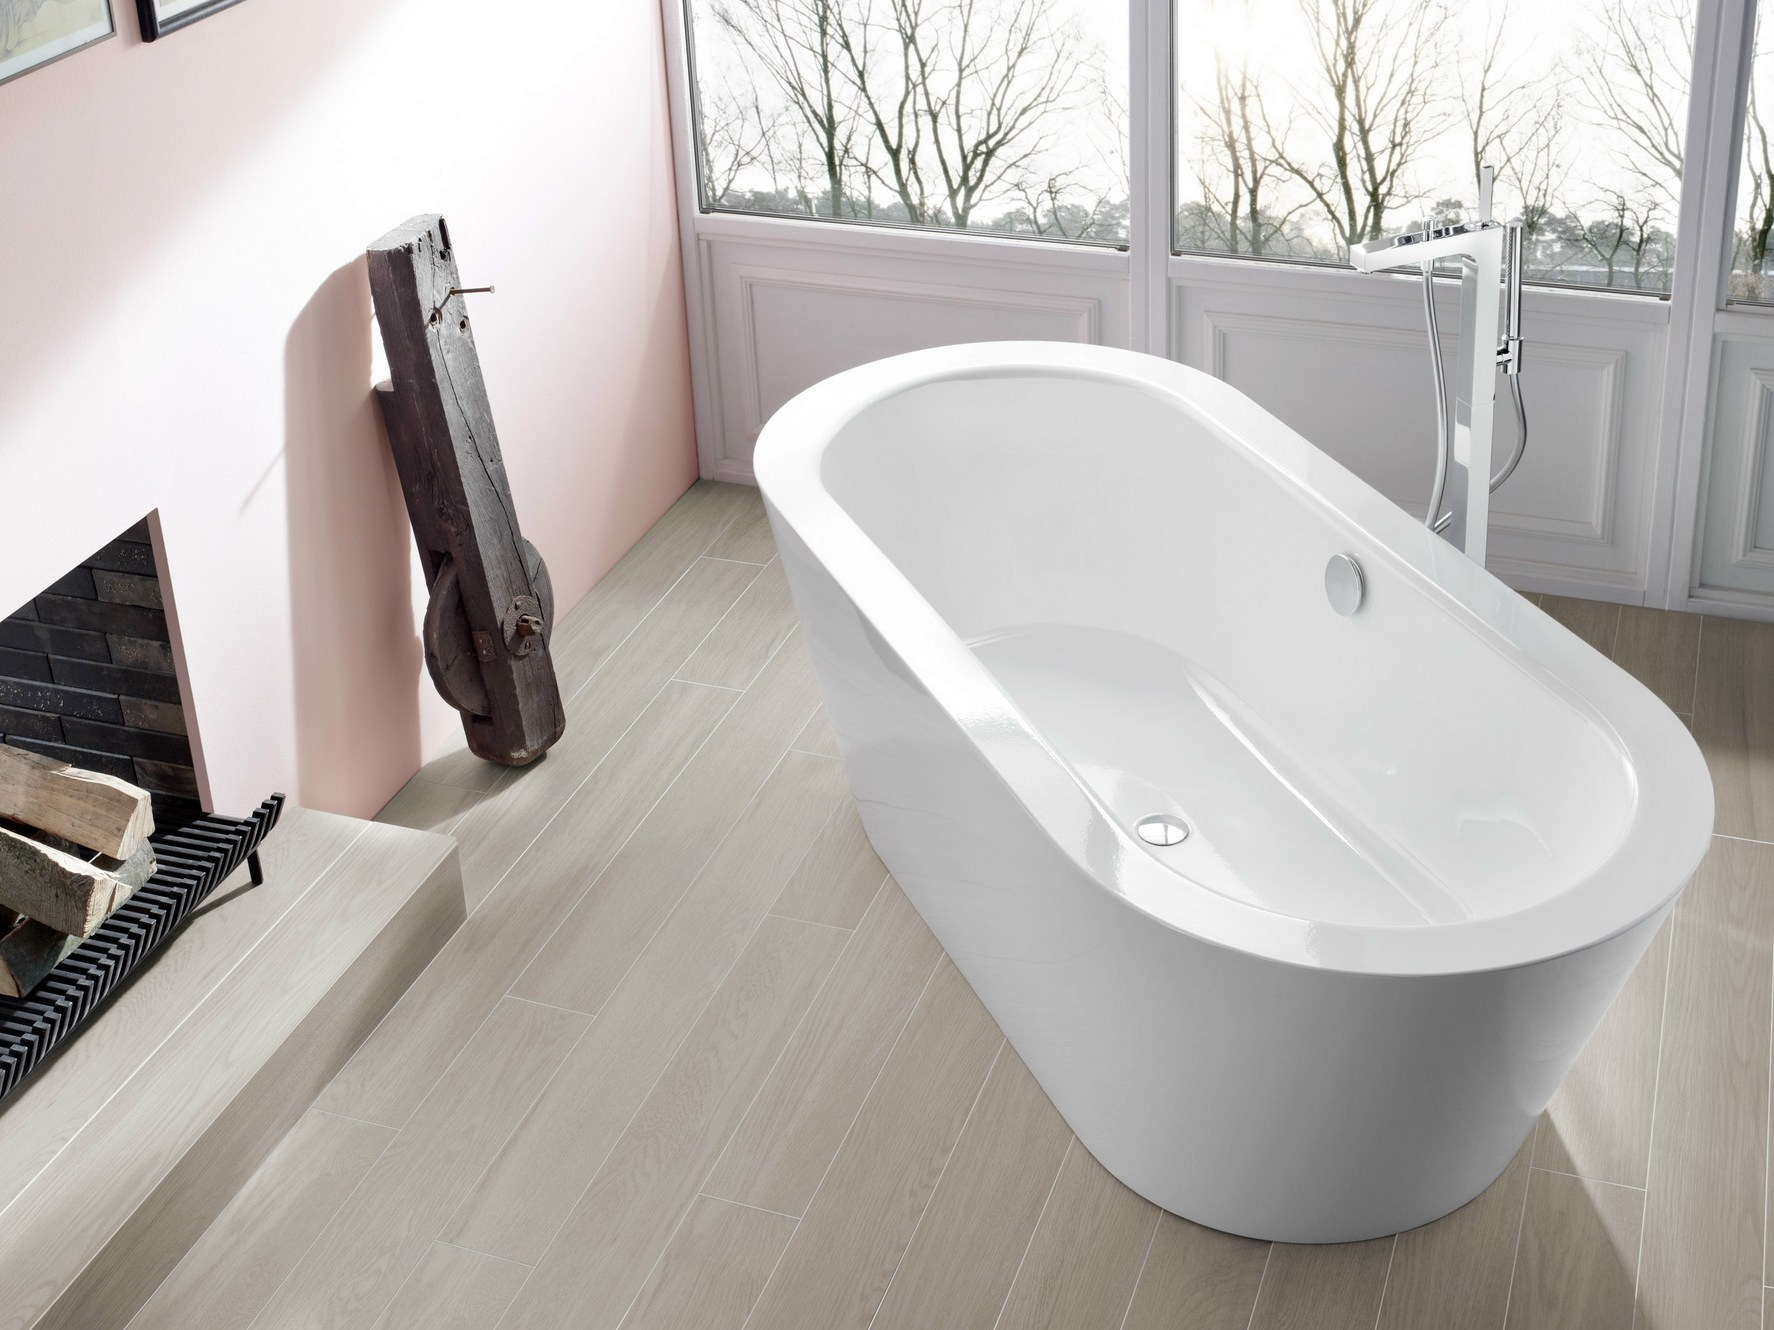 freistehende ovale badewanne bettestarlet oval silhouette. Black Bedroom Furniture Sets. Home Design Ideas